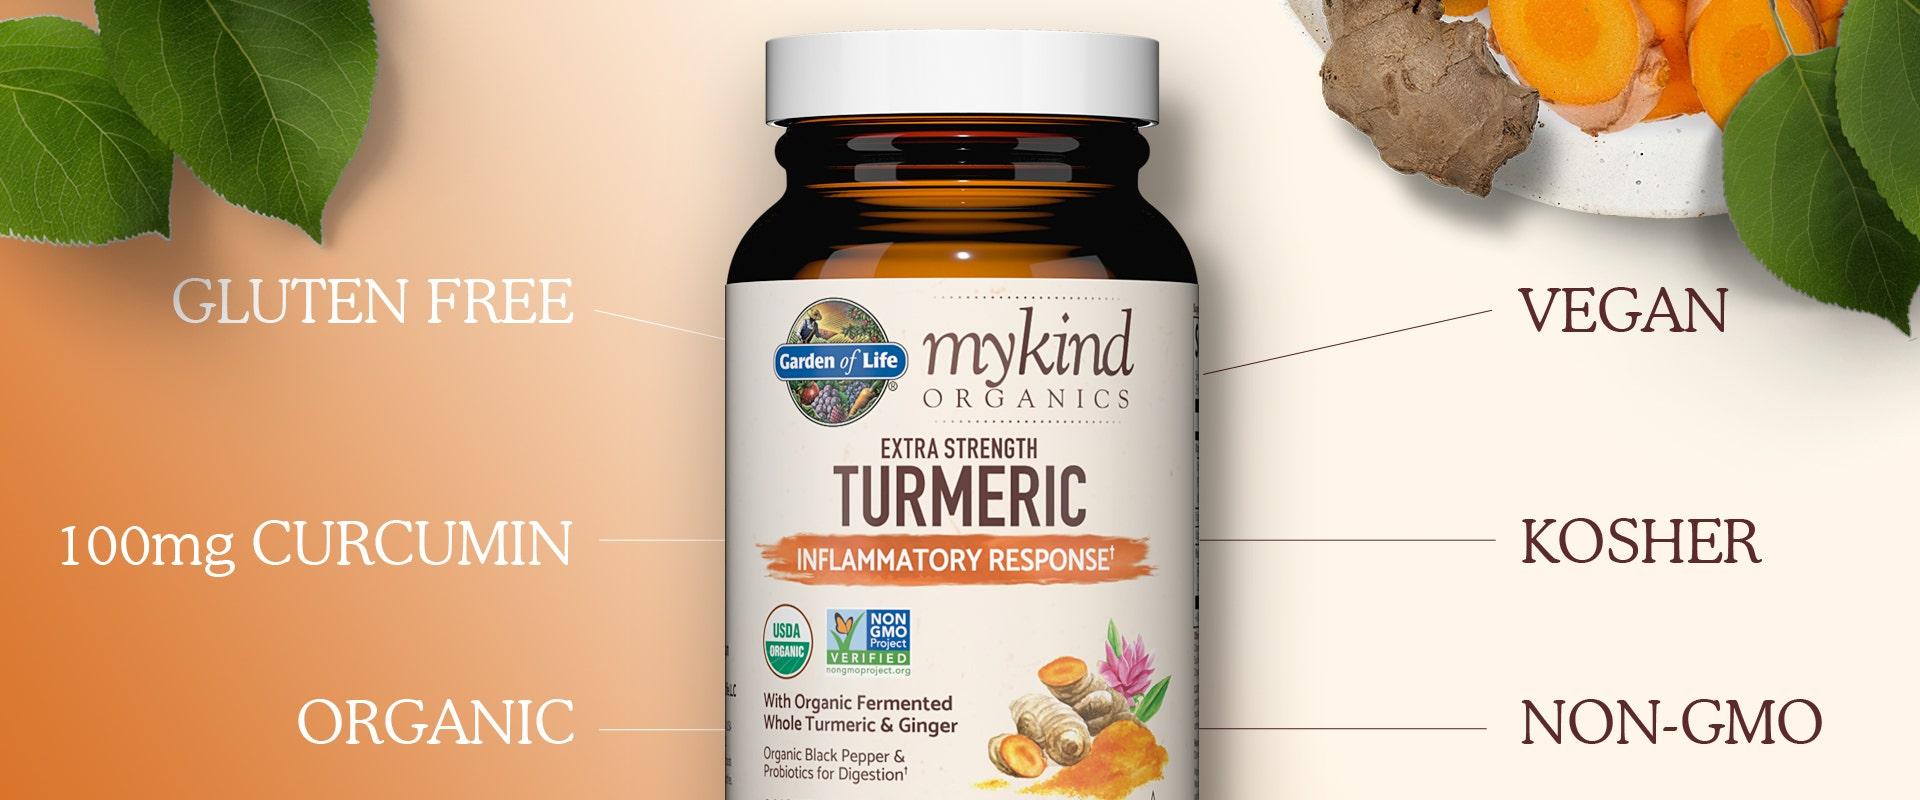 Garden of Life mykind Organics Herbals Turmeric Extra Strength